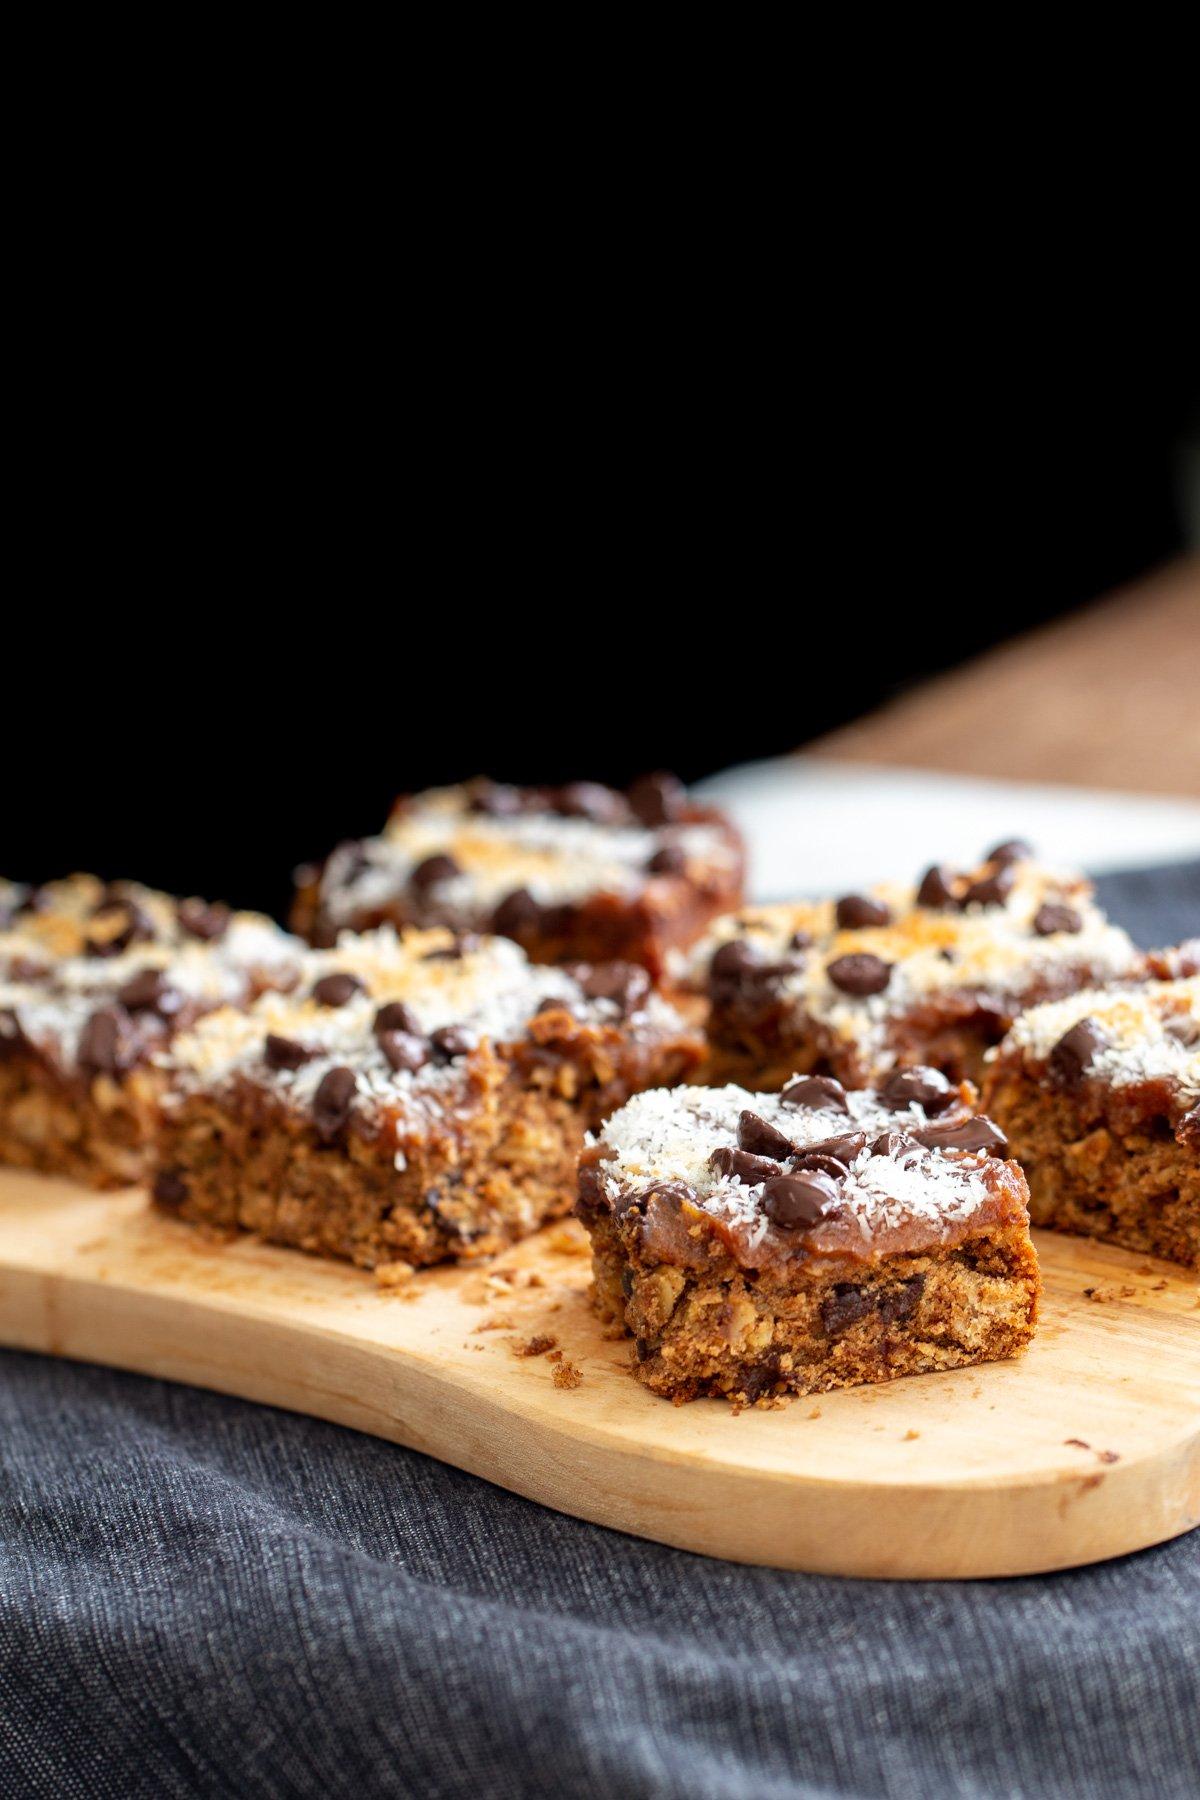 vegan oatmeal date caramel bars on a wooden board